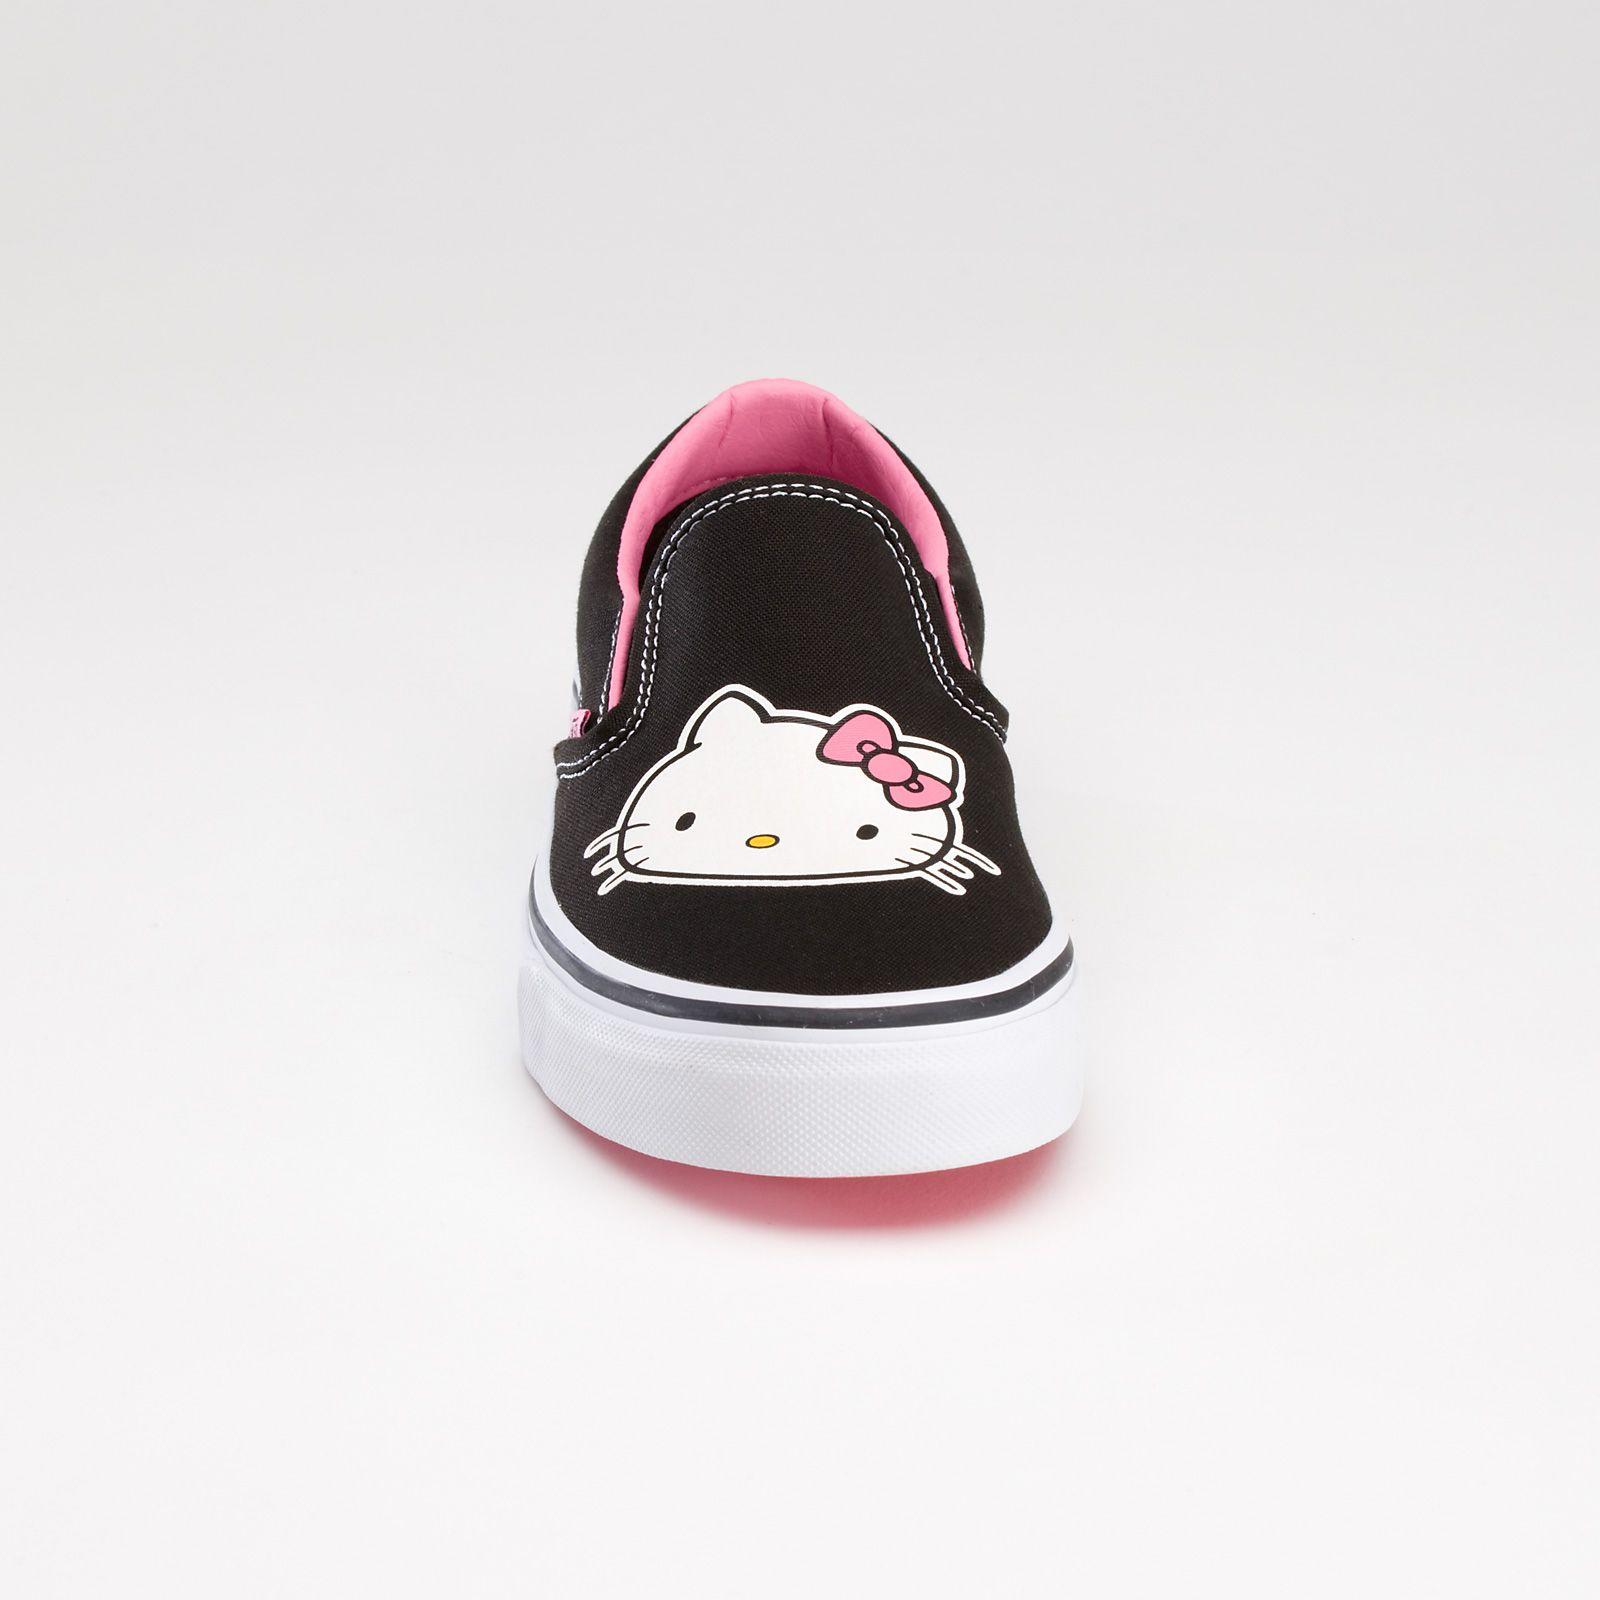 online retailer 908f3 74541 Hello Kitty Vans I just ordered online